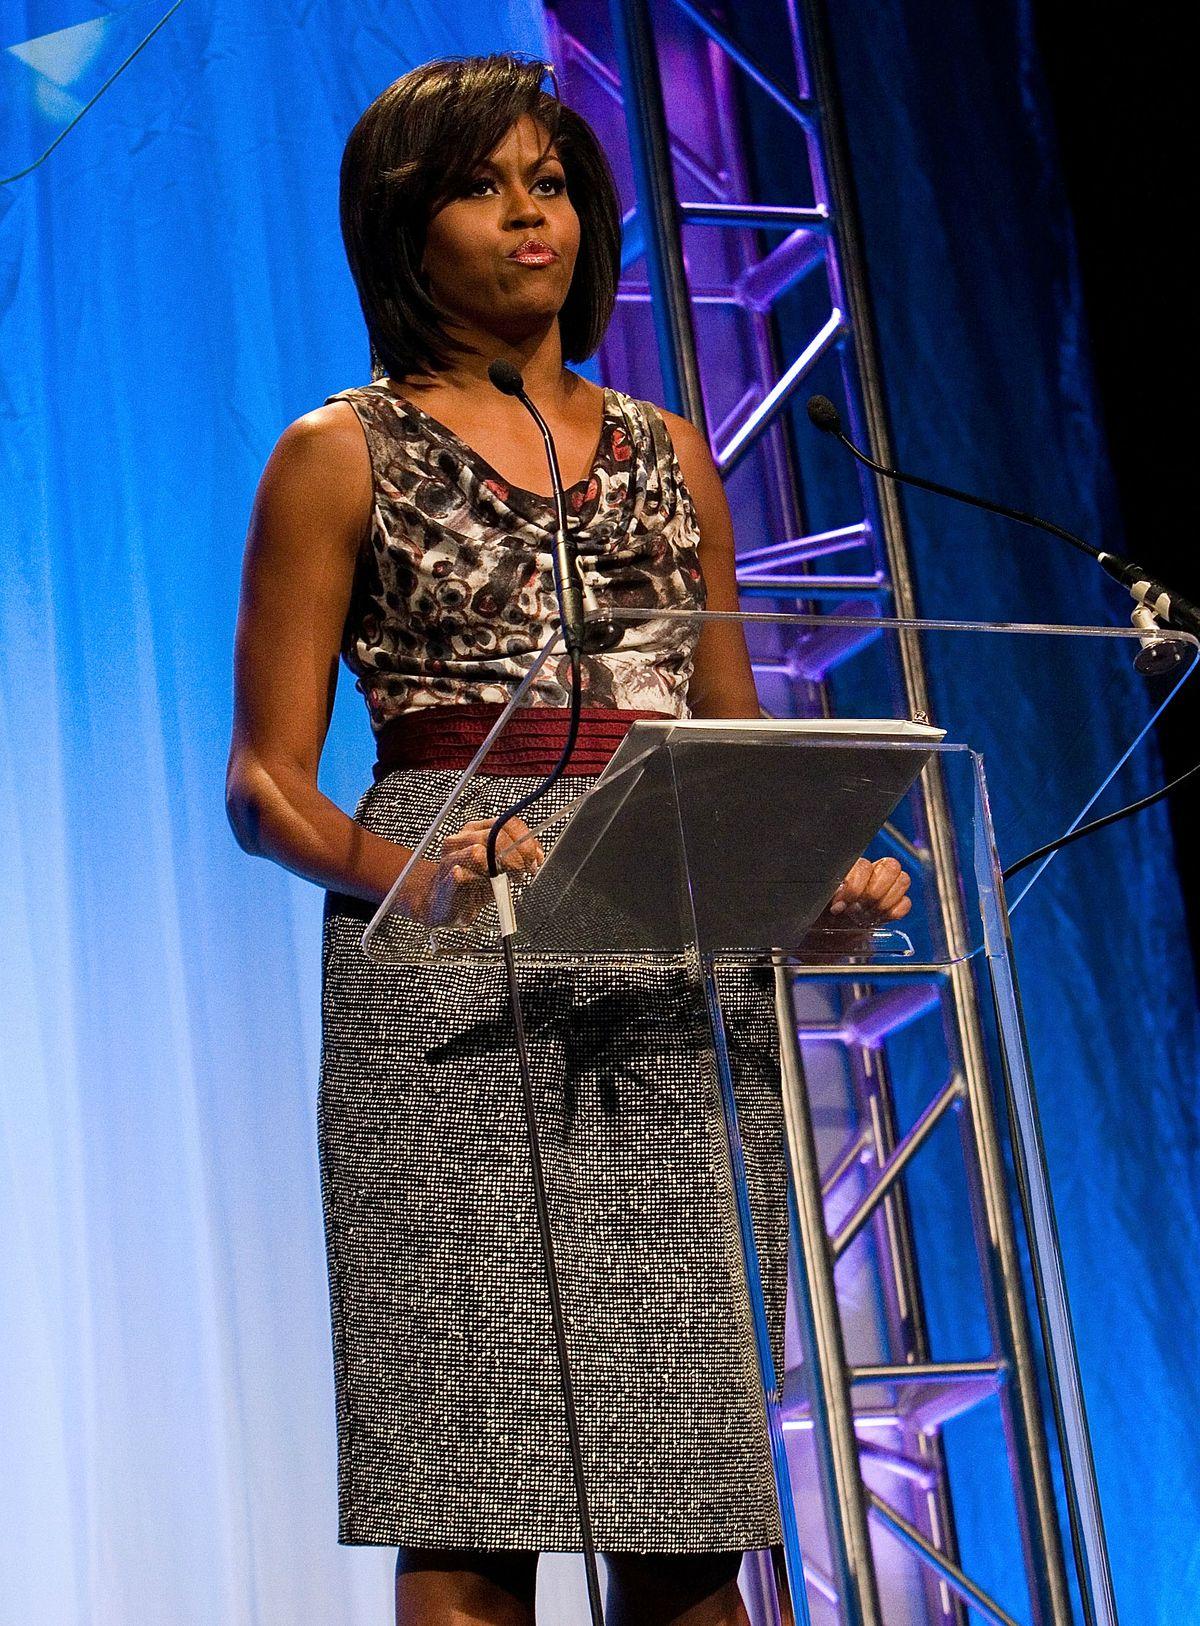 Michelle Obama speaking from podium in Rachel Roy dress in June 2009